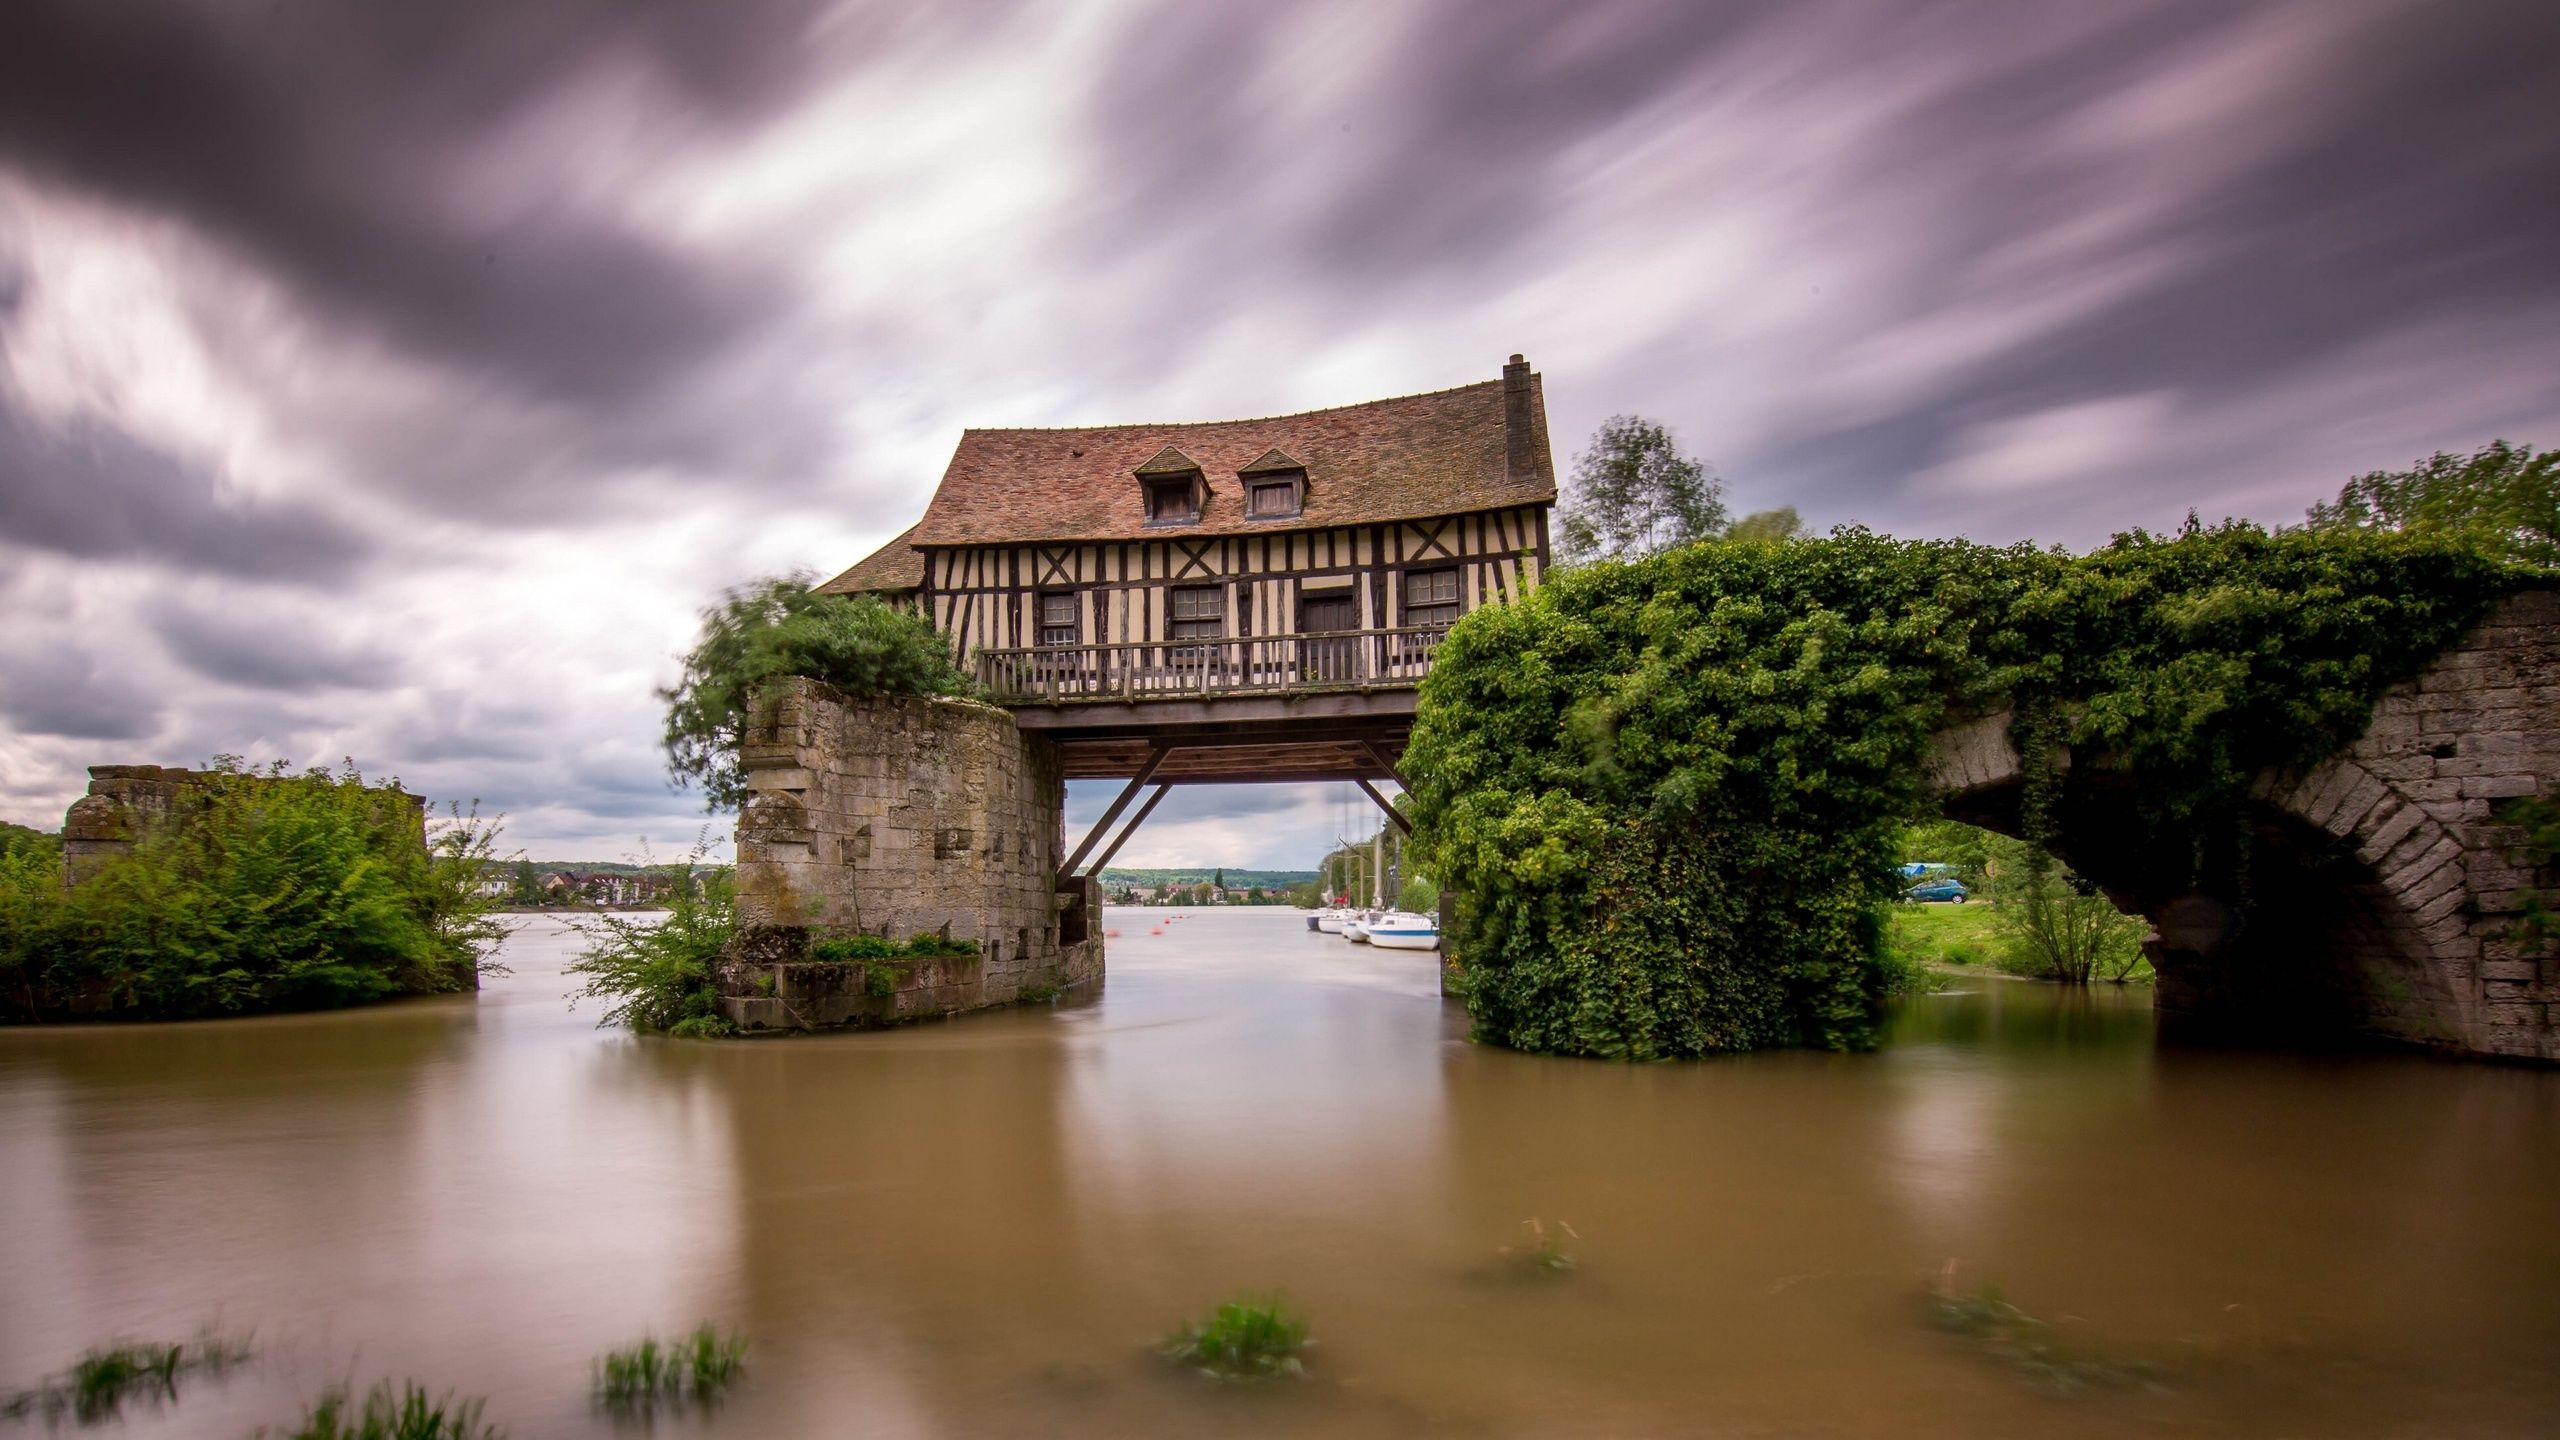 природа страны архитектура река мост Александр скачать